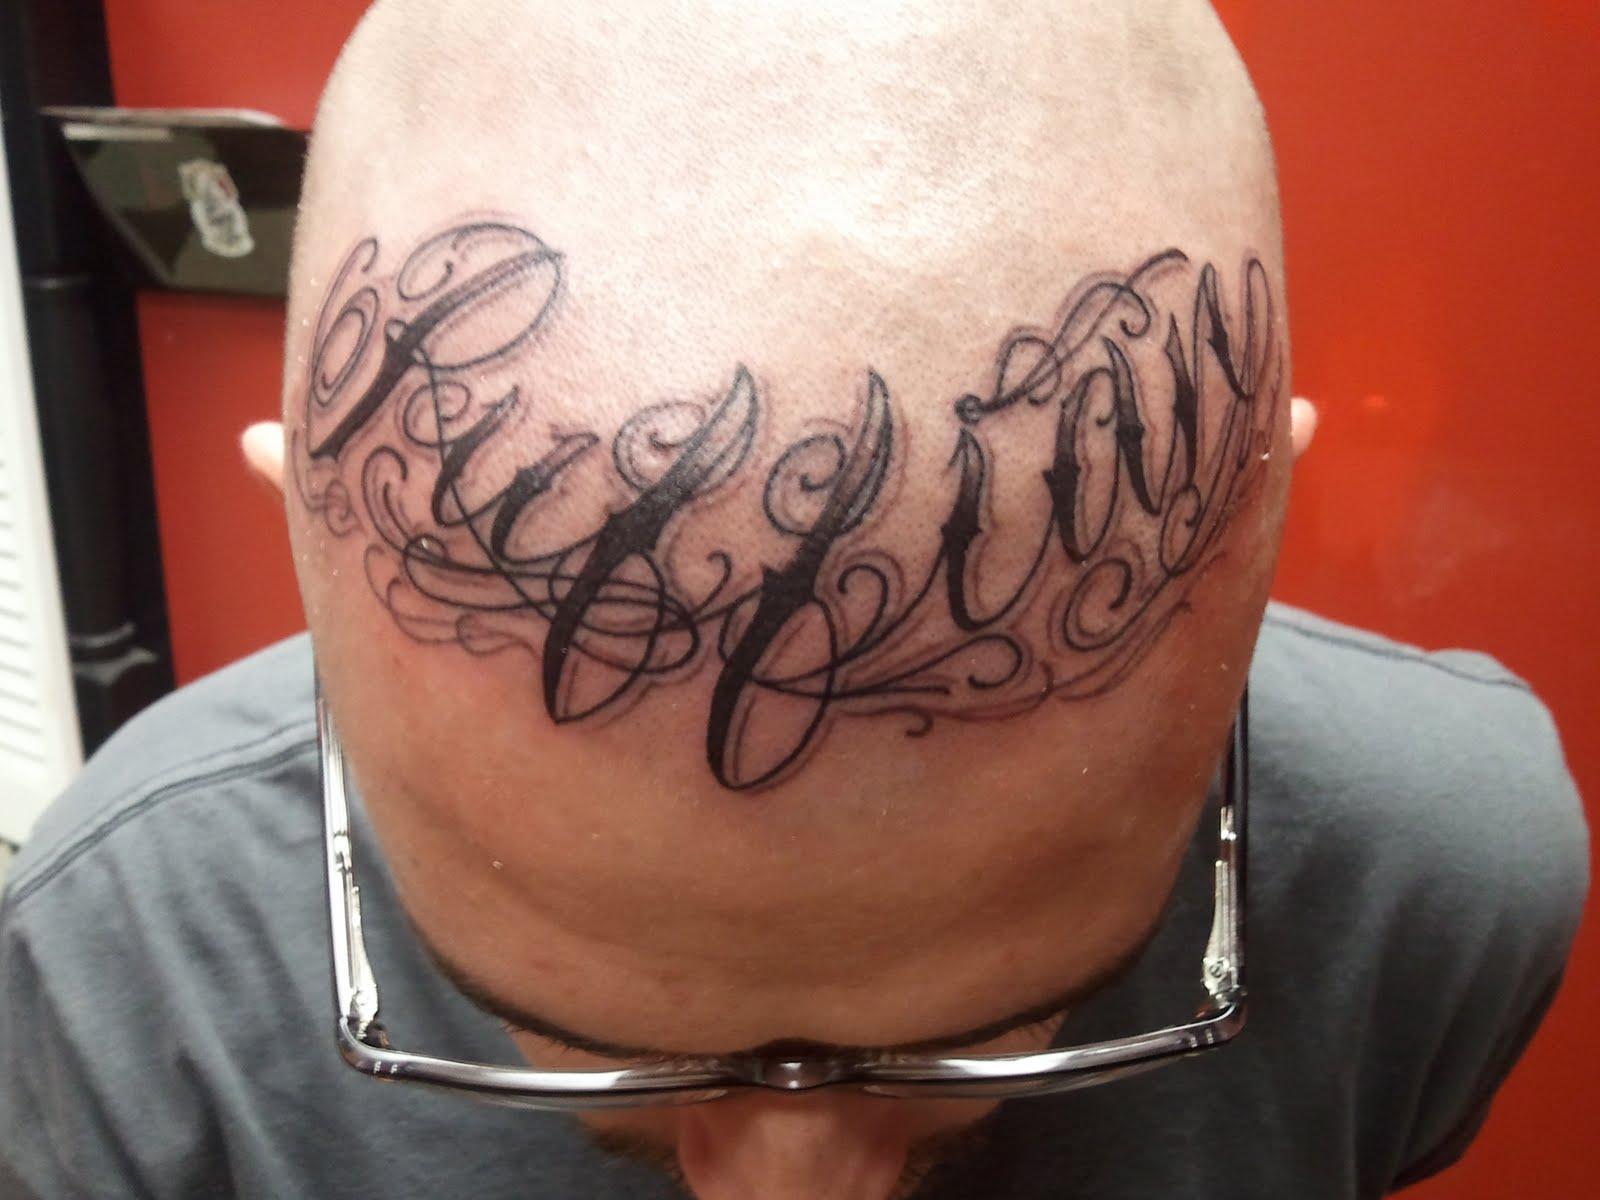 death or glory some syracuse tattoos